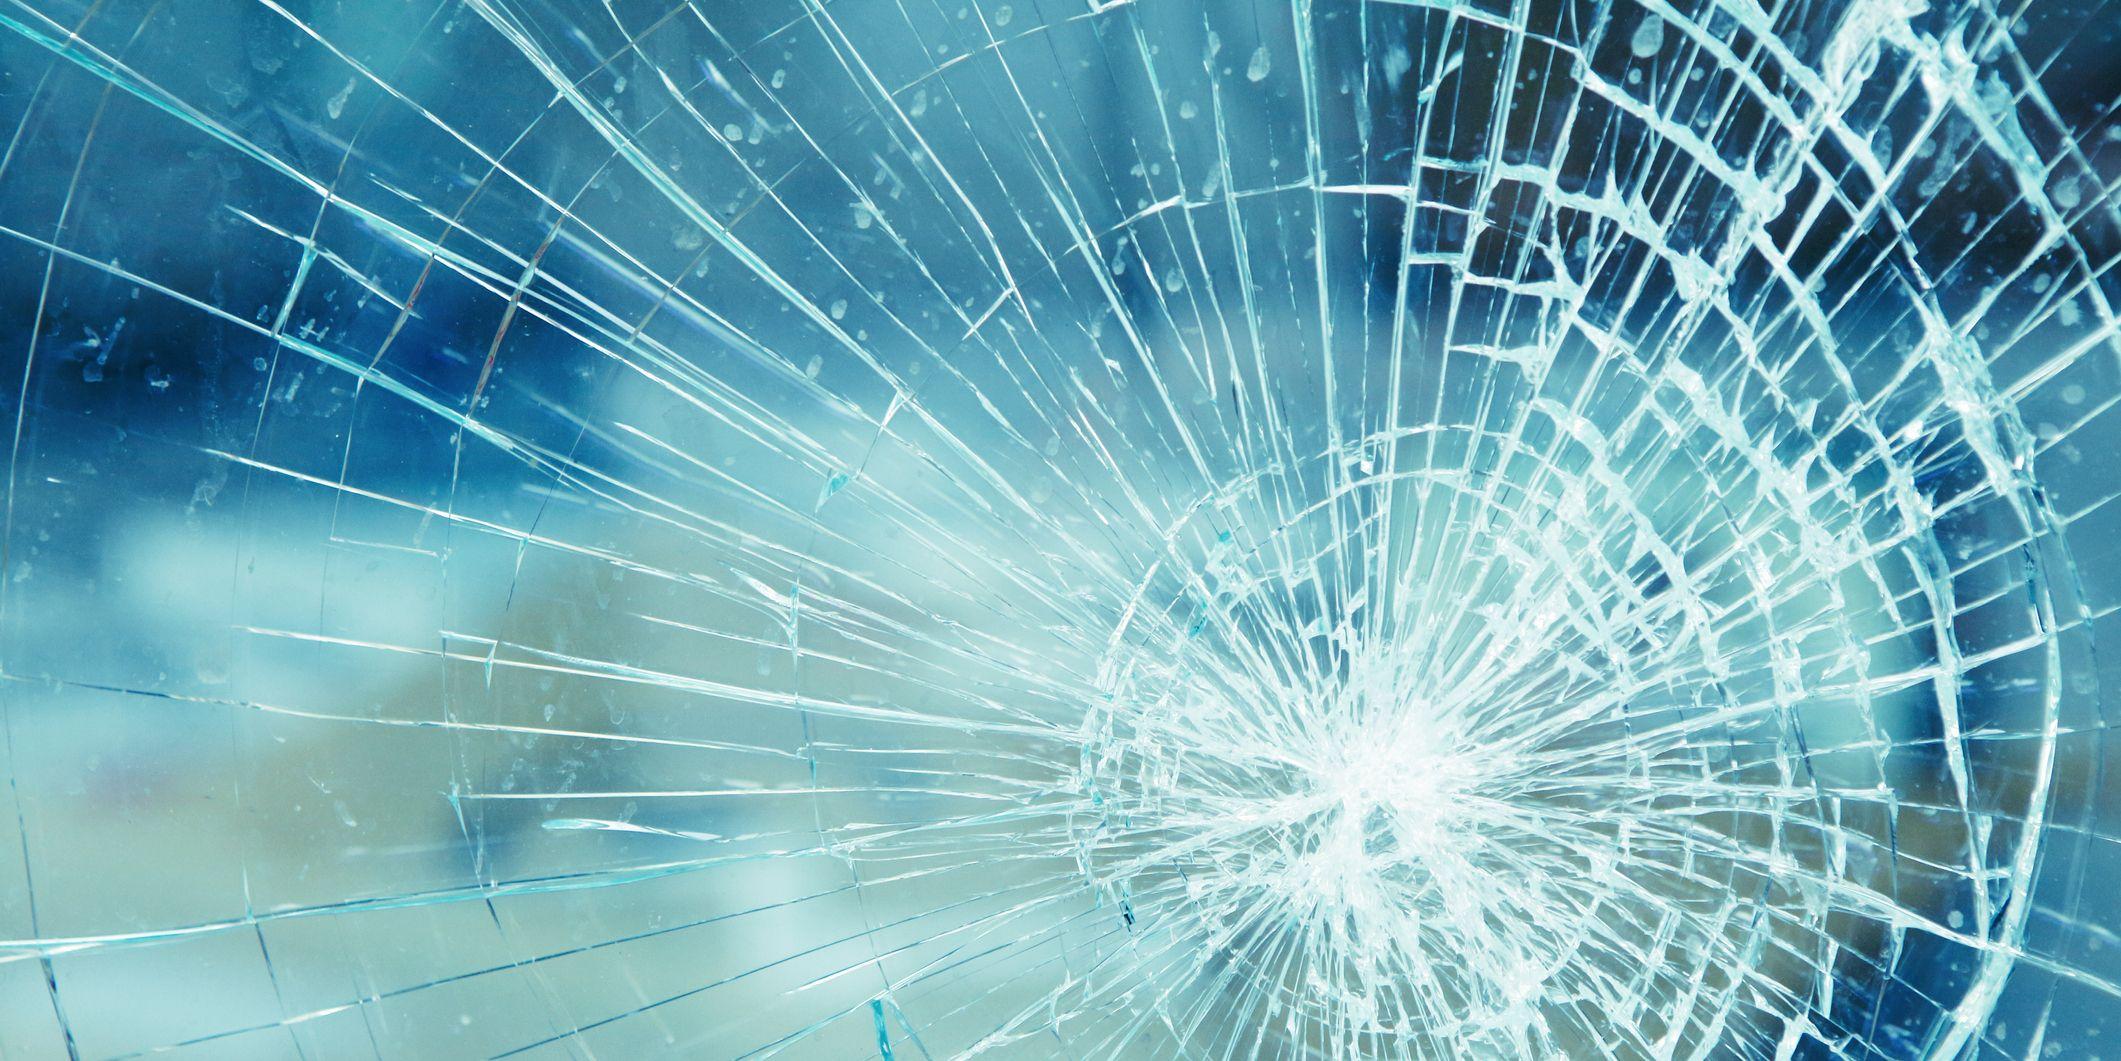 Detail of broken glass